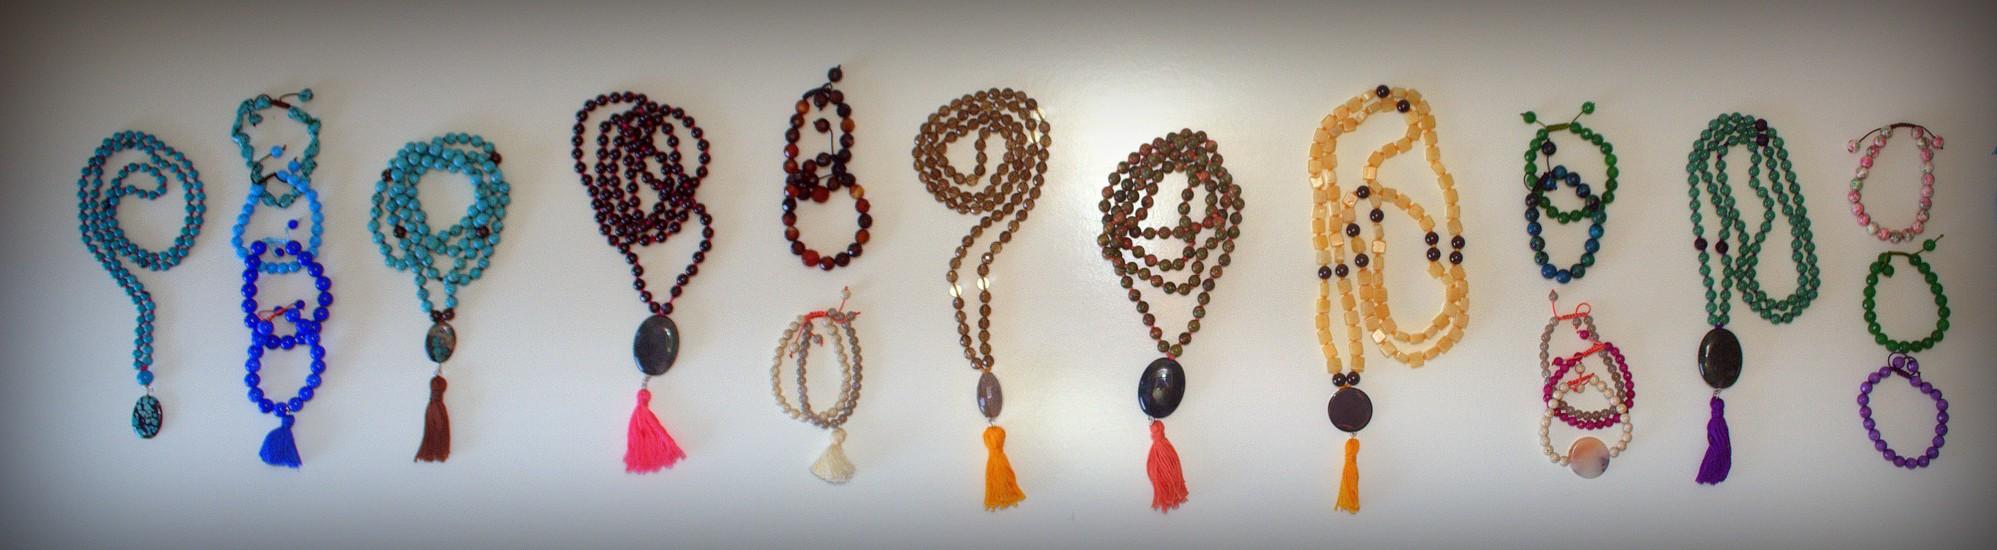 Viv's PURE: Handmade malas and bracelets